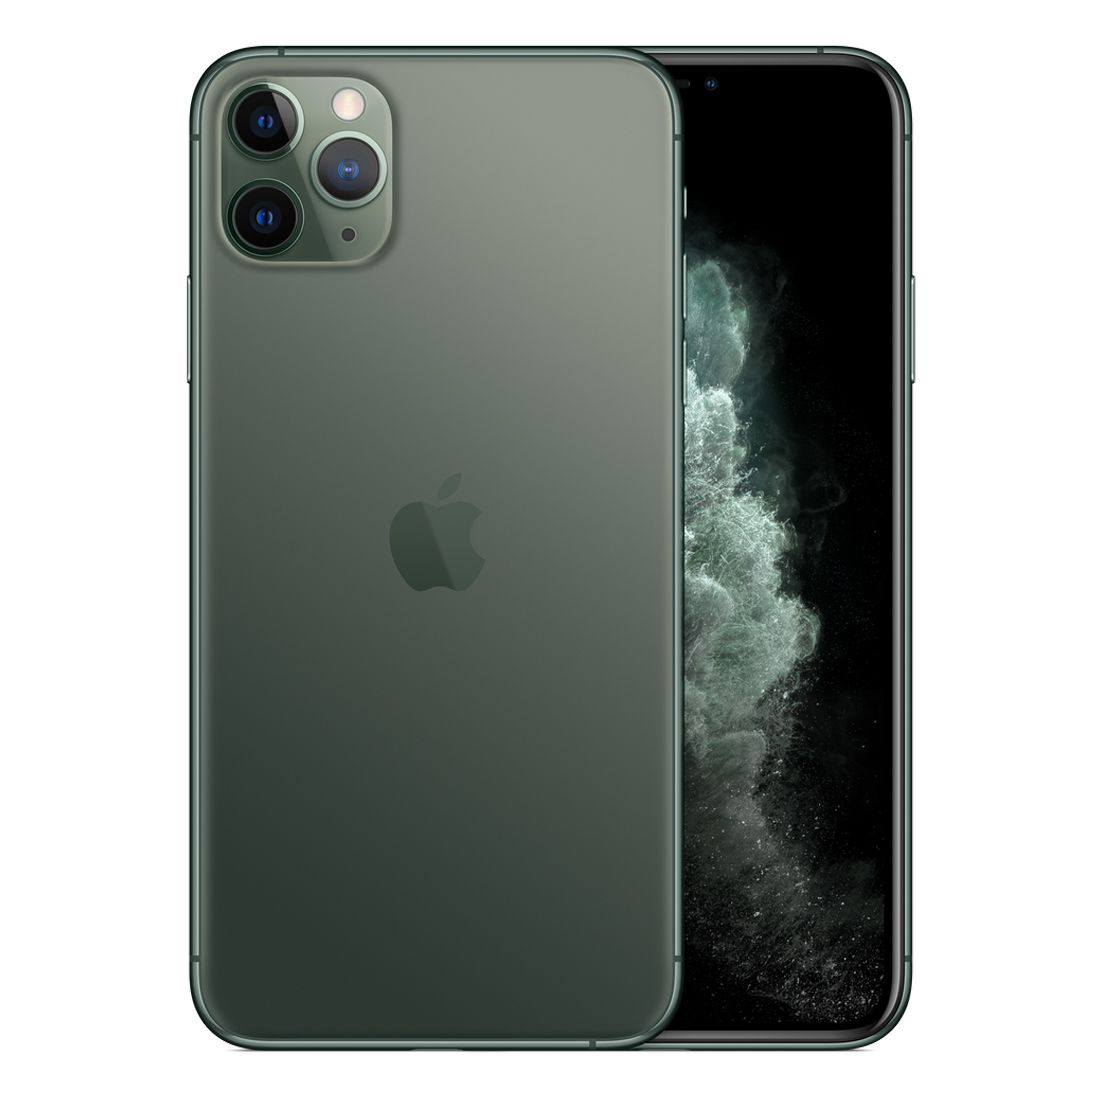 Apple iPhone 11 Pro Max 64GB - Midnight Green